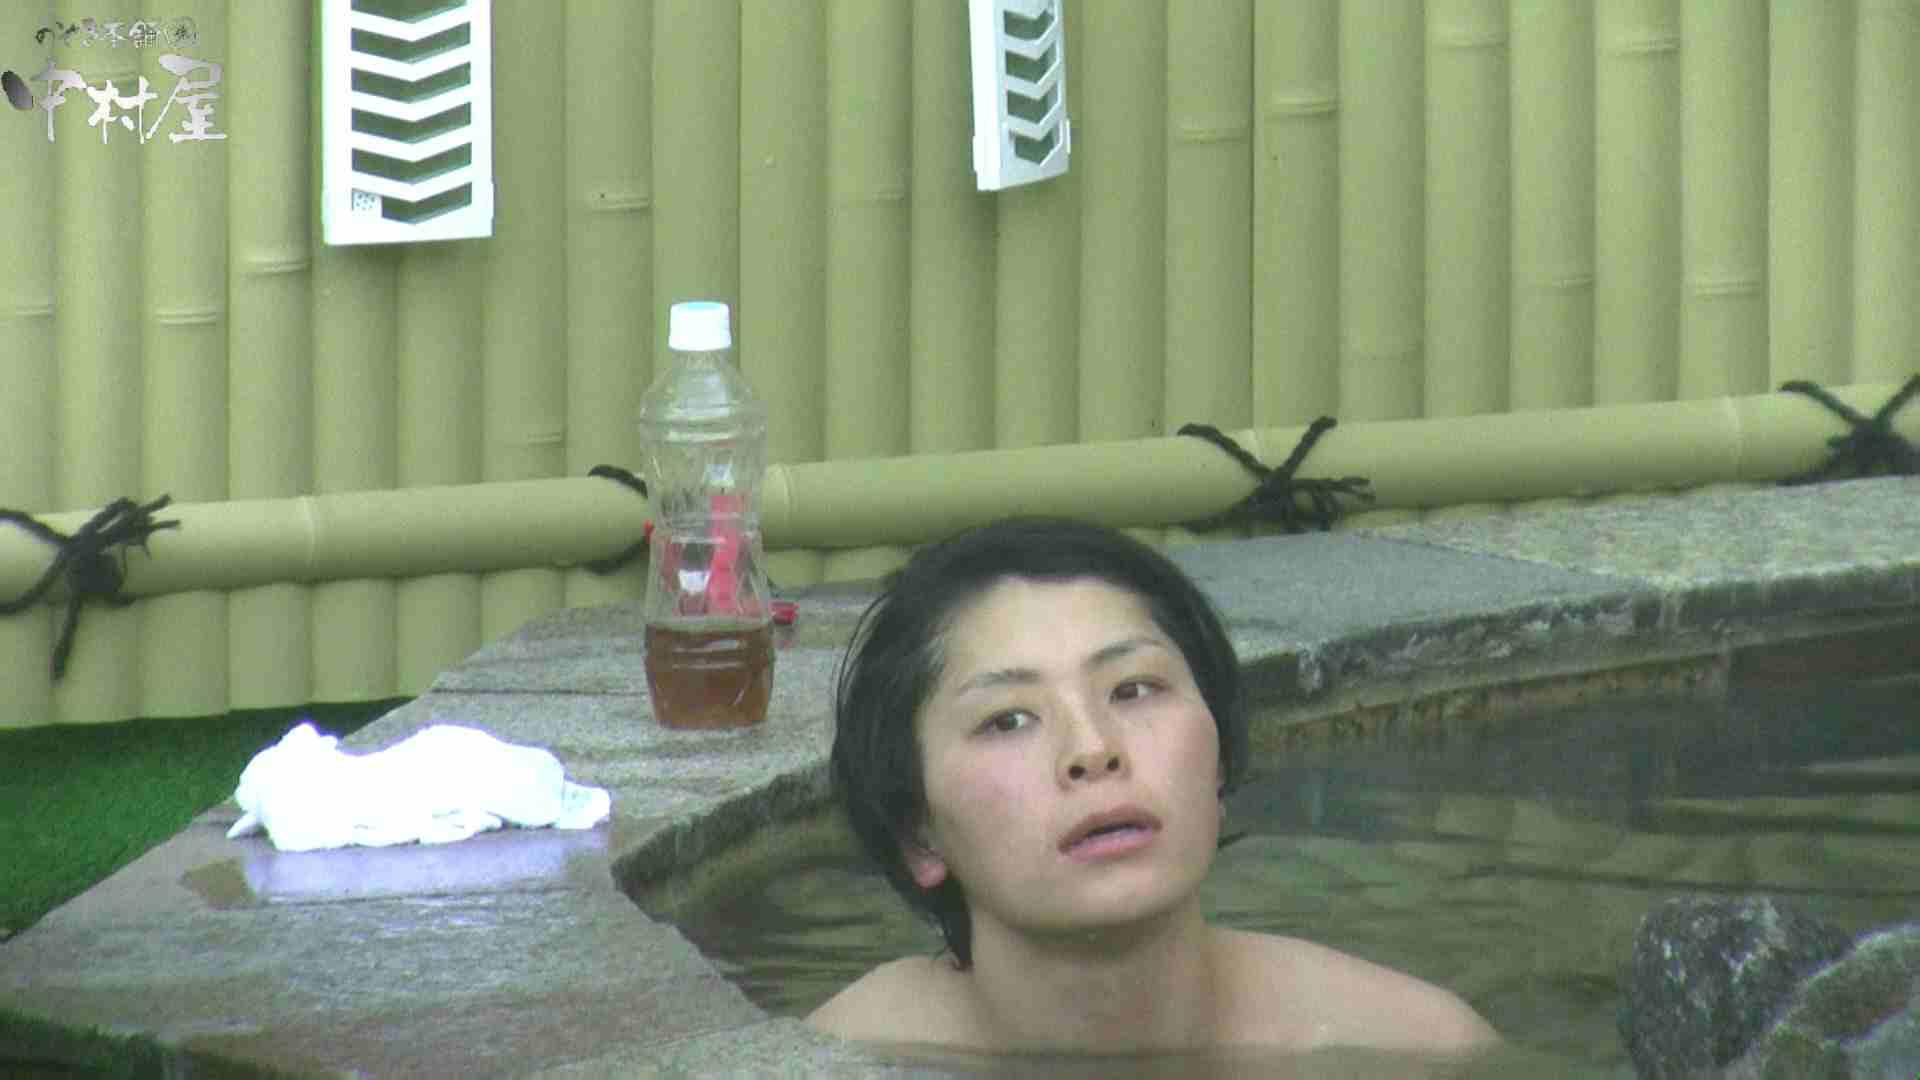 Aquaな露天風呂Vol.970 OL  59連発 17